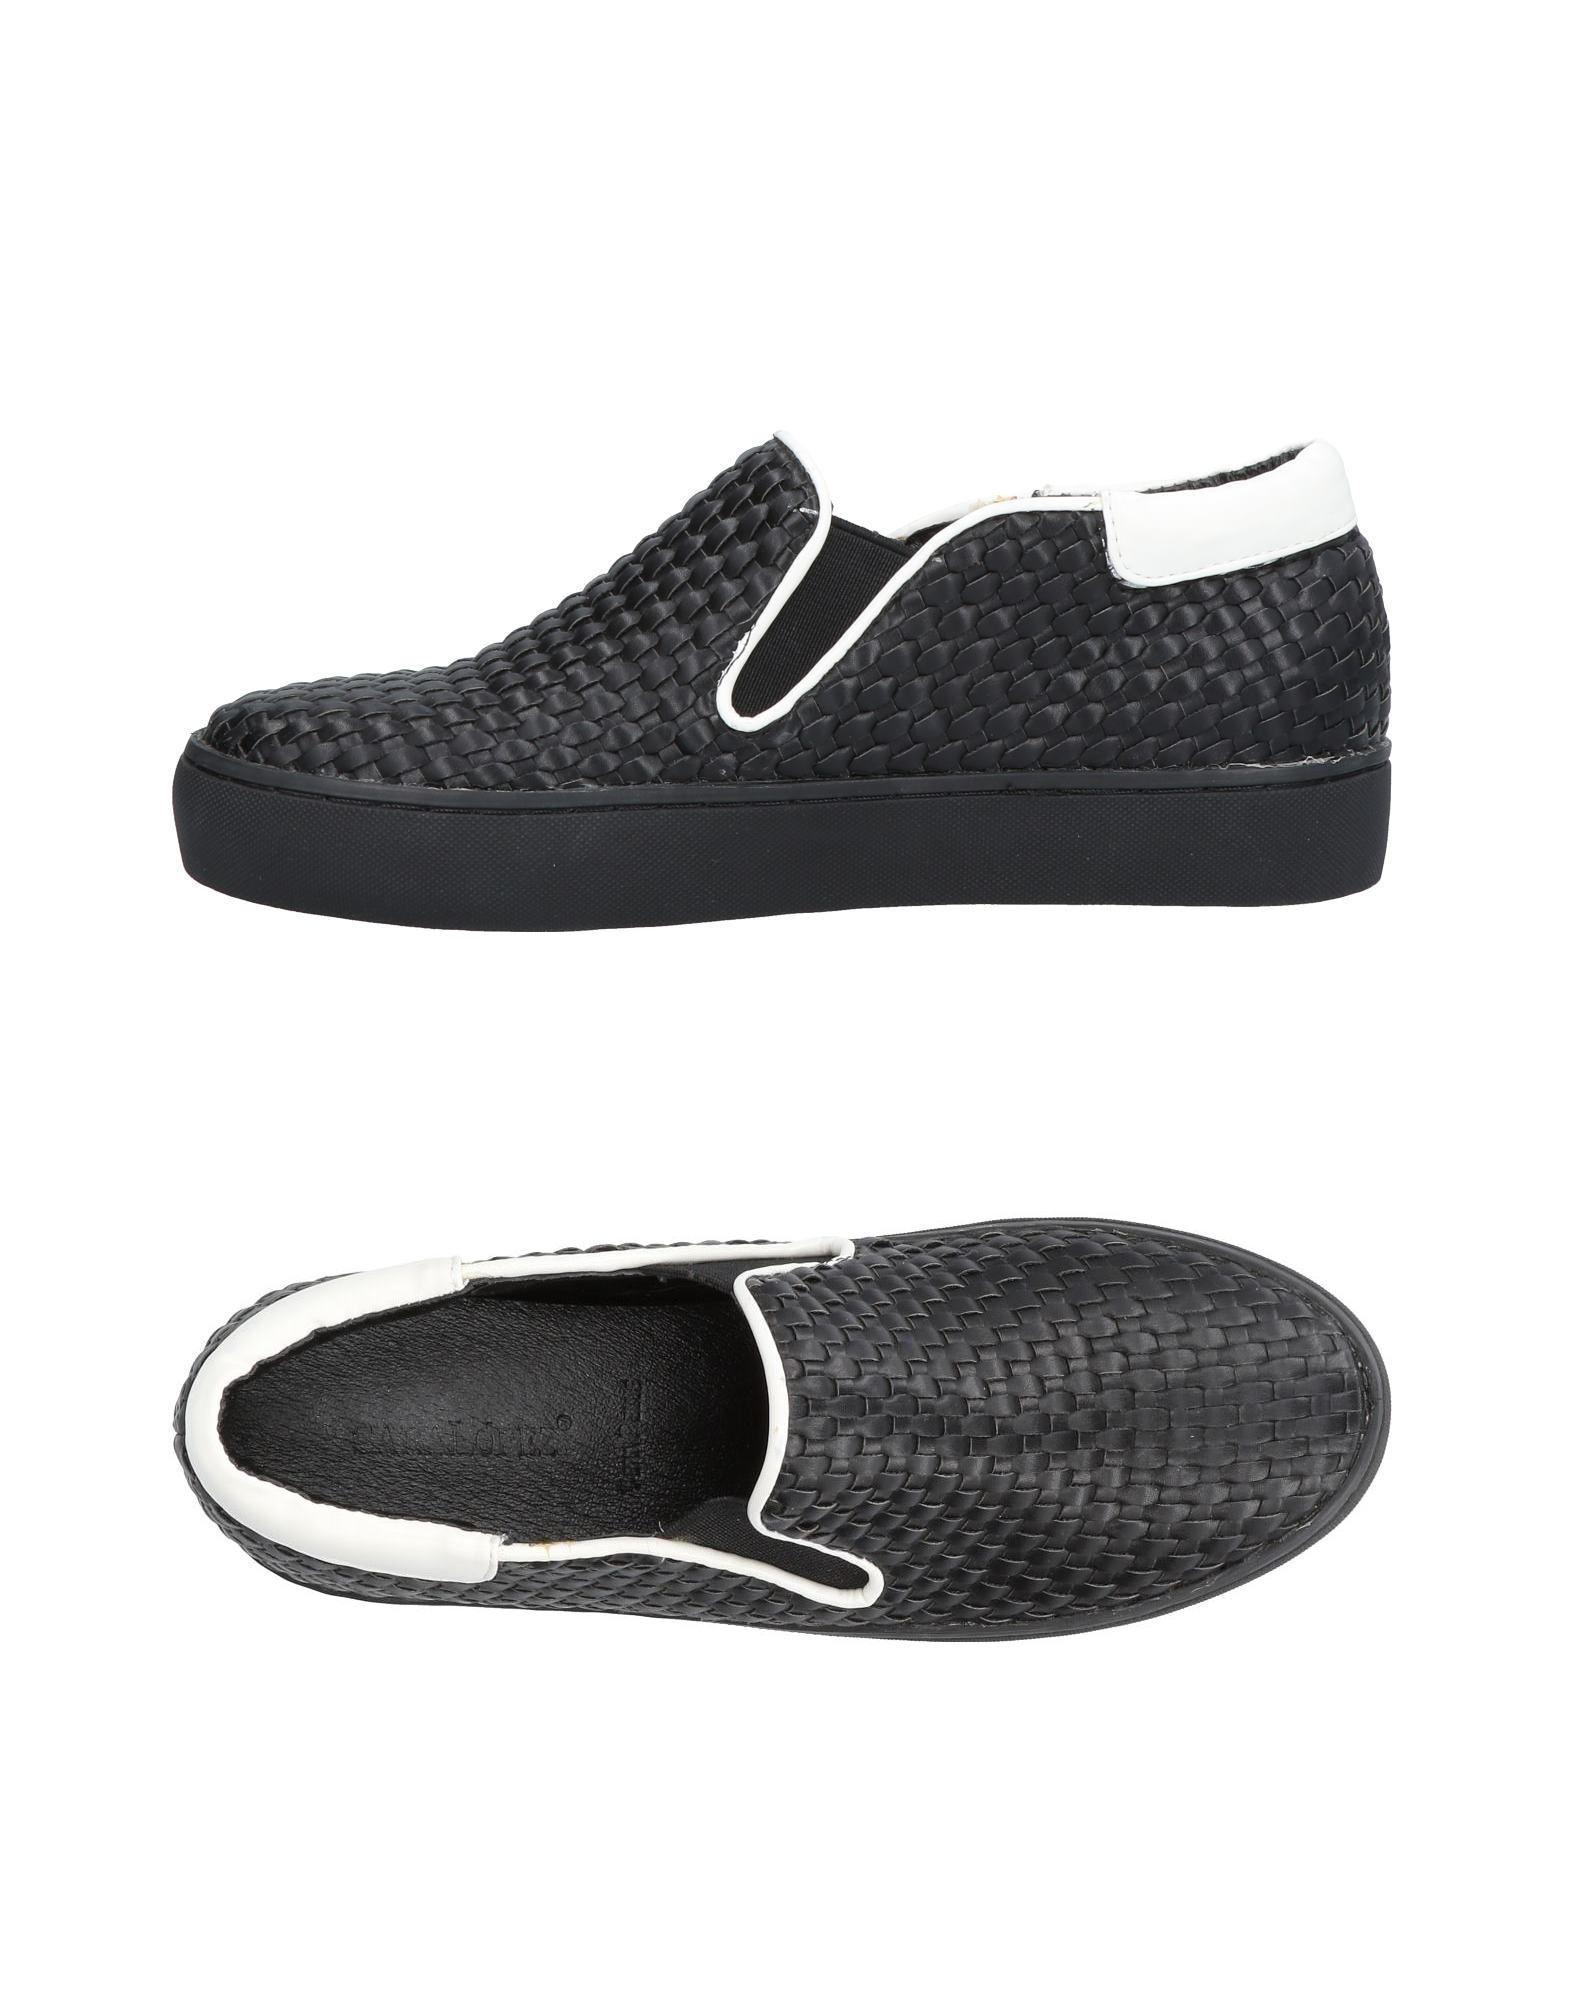 SARA LÓPEZ Низкие кеды и кроссовки sara lópez низкие кеды и кроссовки